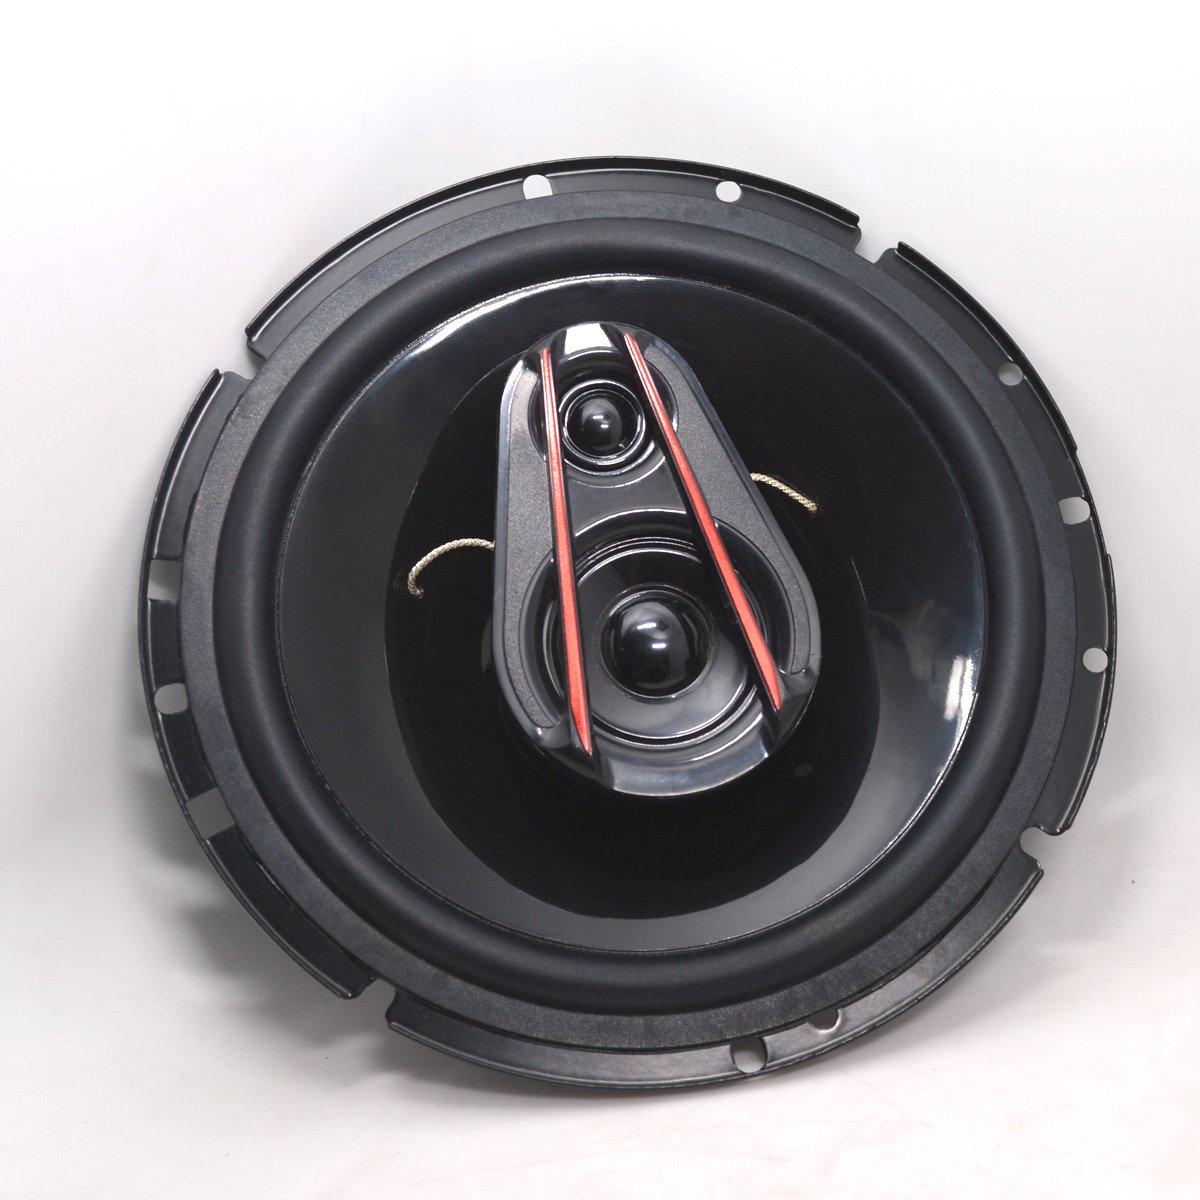 Pair Car Sound Speaker 6.5 Inch Full Range Car Speaker 3 Ways Coaxial Car Speakers-Set of 2 OMV International Limited 4350460126